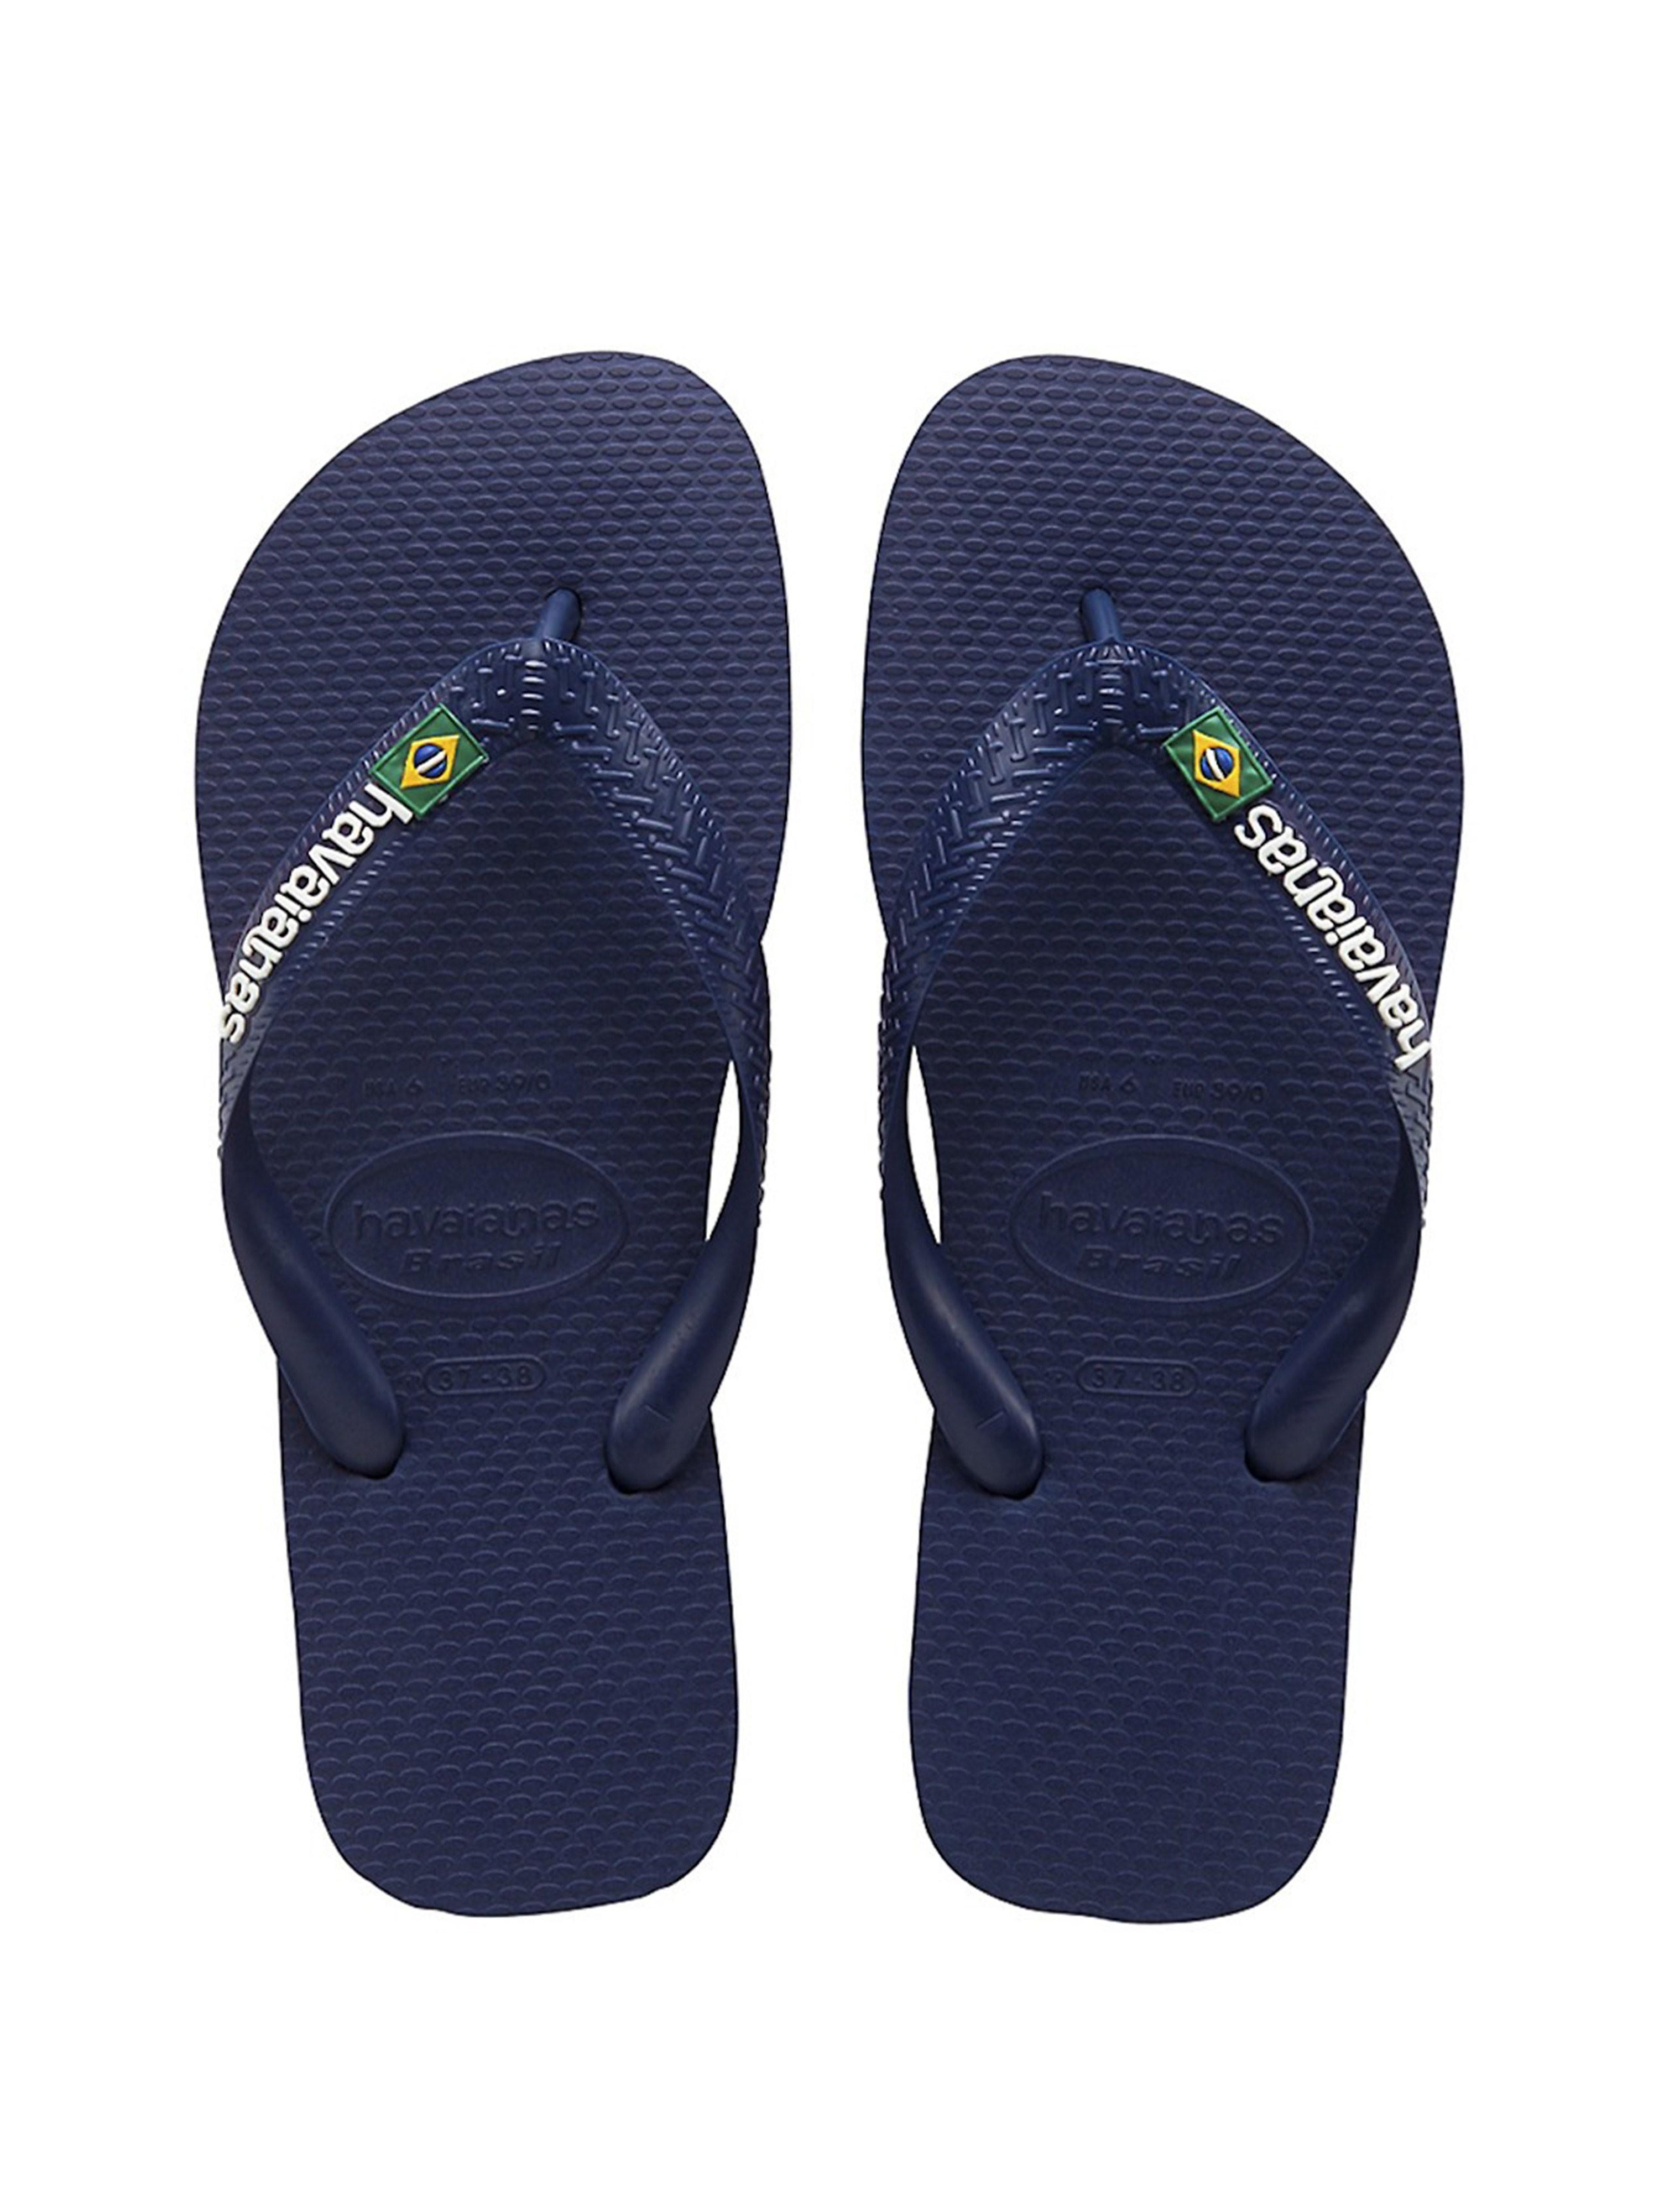 Havaianas Men's Brazil Logo Tonal Strap Flip Flops - Navy Blue